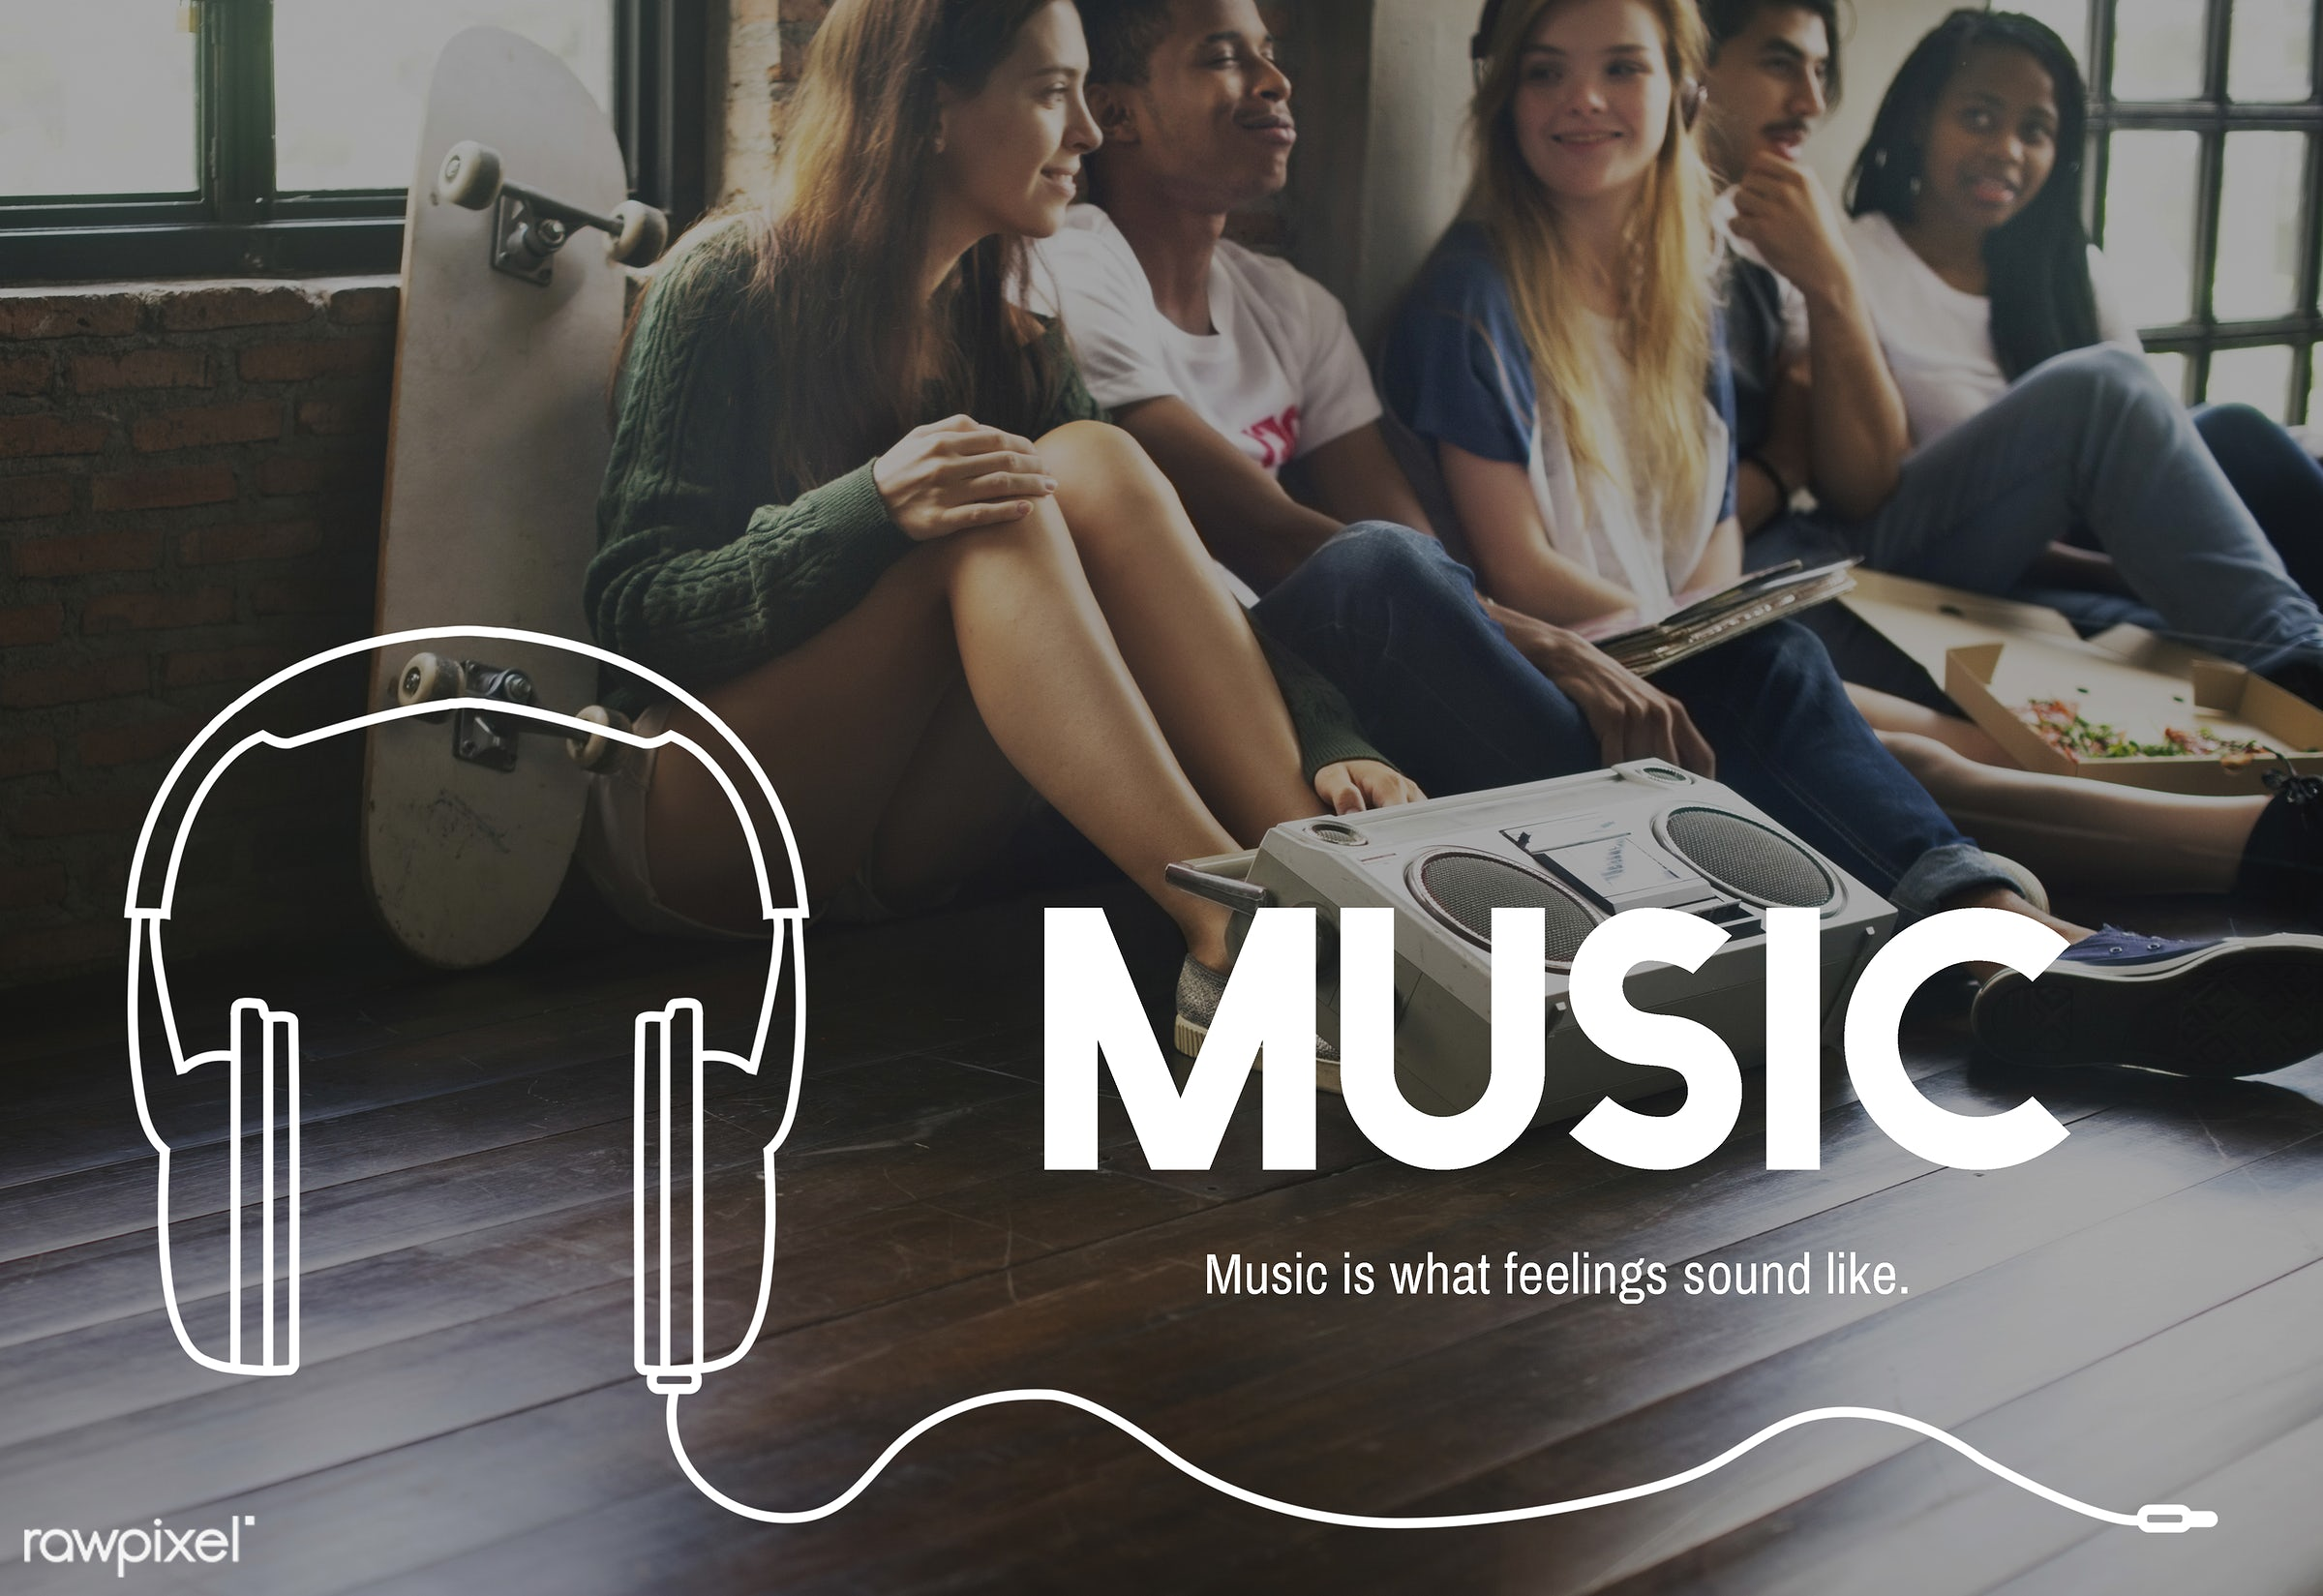 audio, broadcast, digital media, enjoy life, entertain, entertainment, friends, friendship, fun, graphic, hangout, headphone...